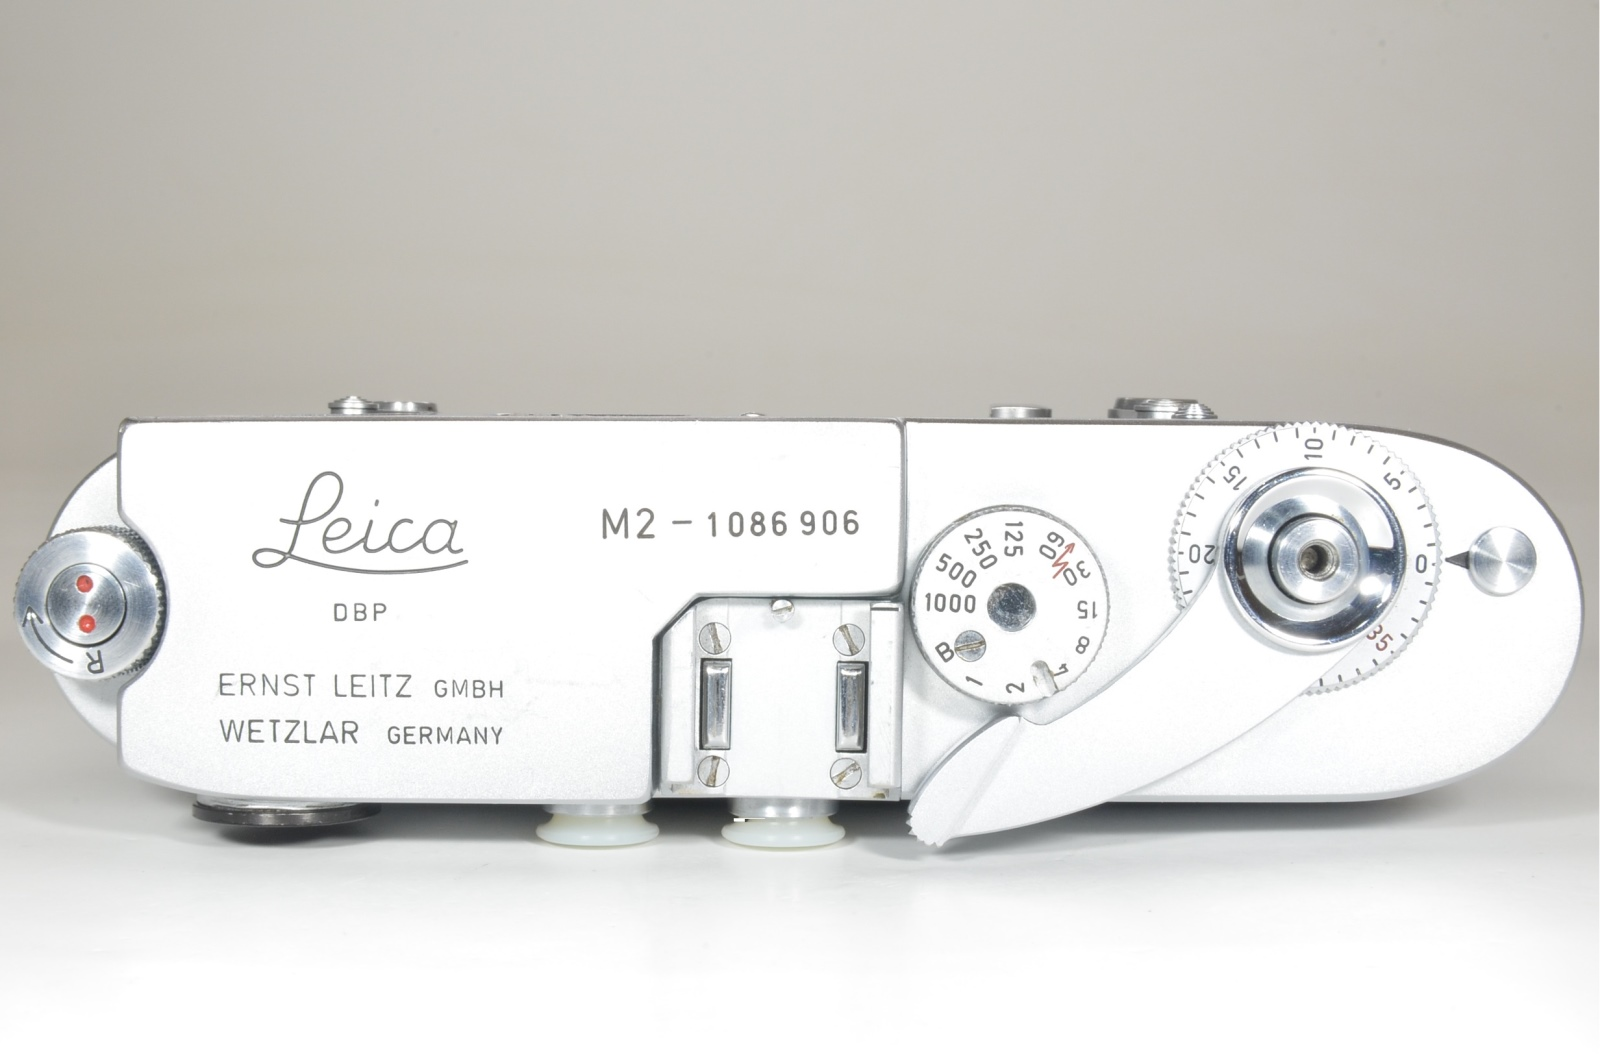 leica m2 self timer rangefinder film camera s/n 1086906 year 1963